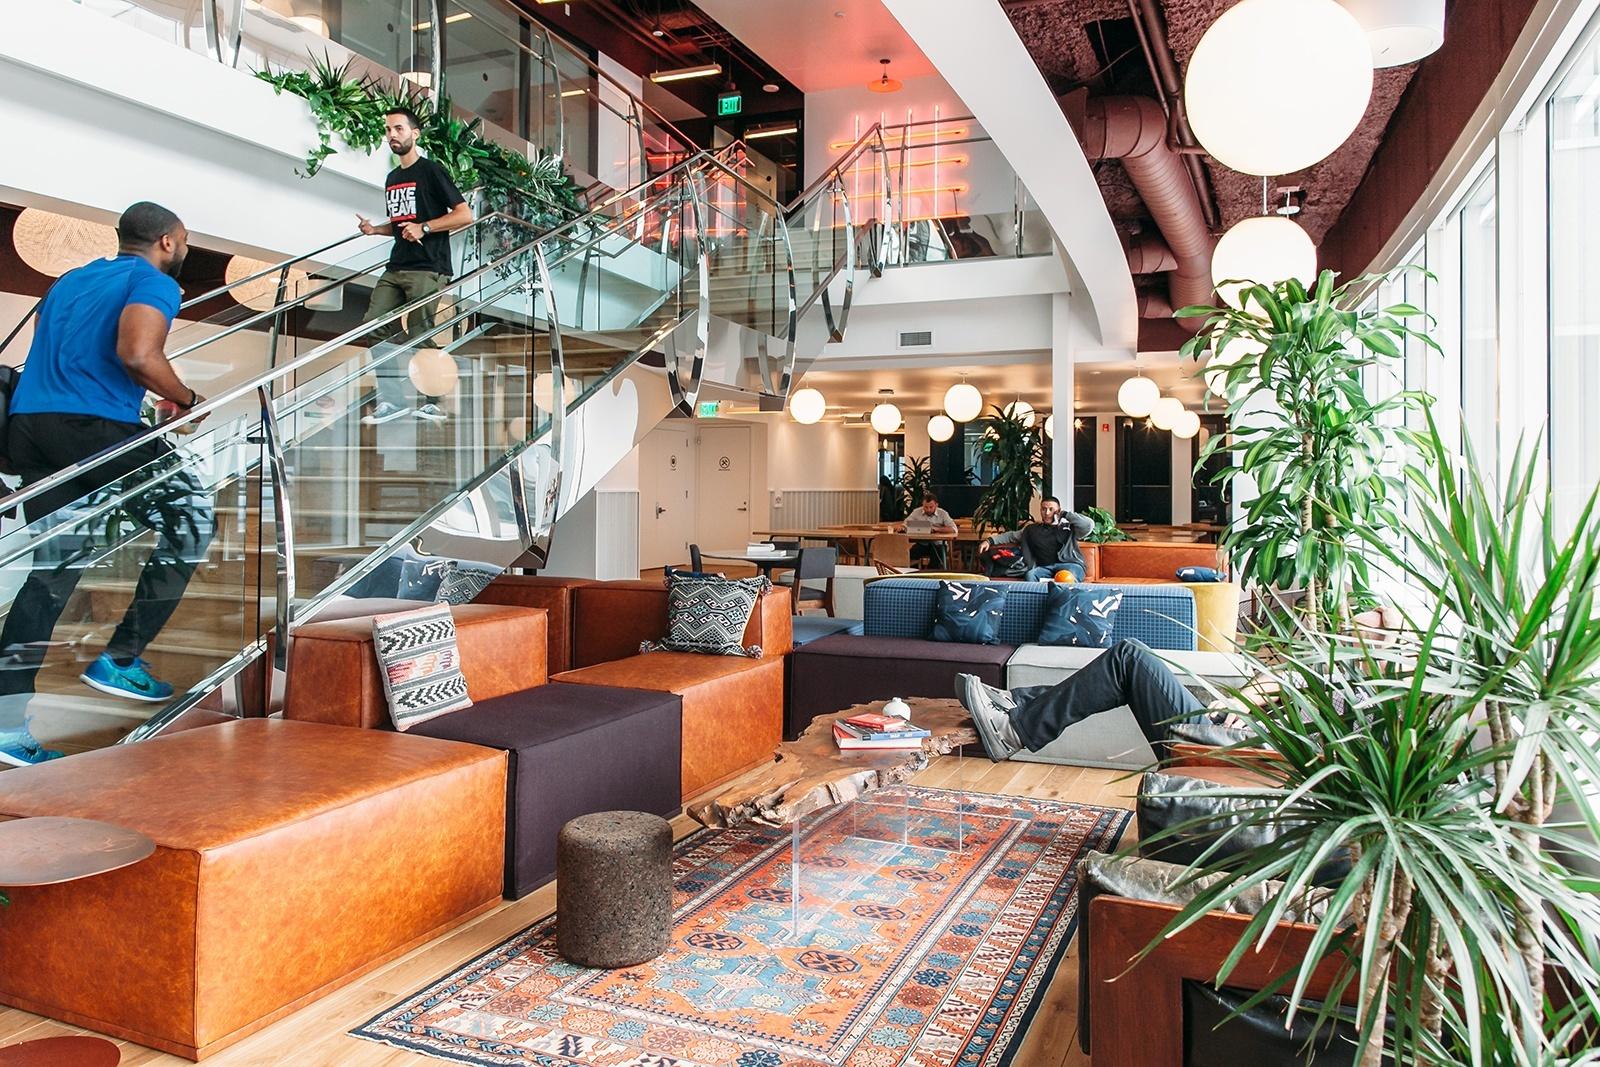 Inside wework gas tower officelovin 39 - Interior design companies los angeles ...